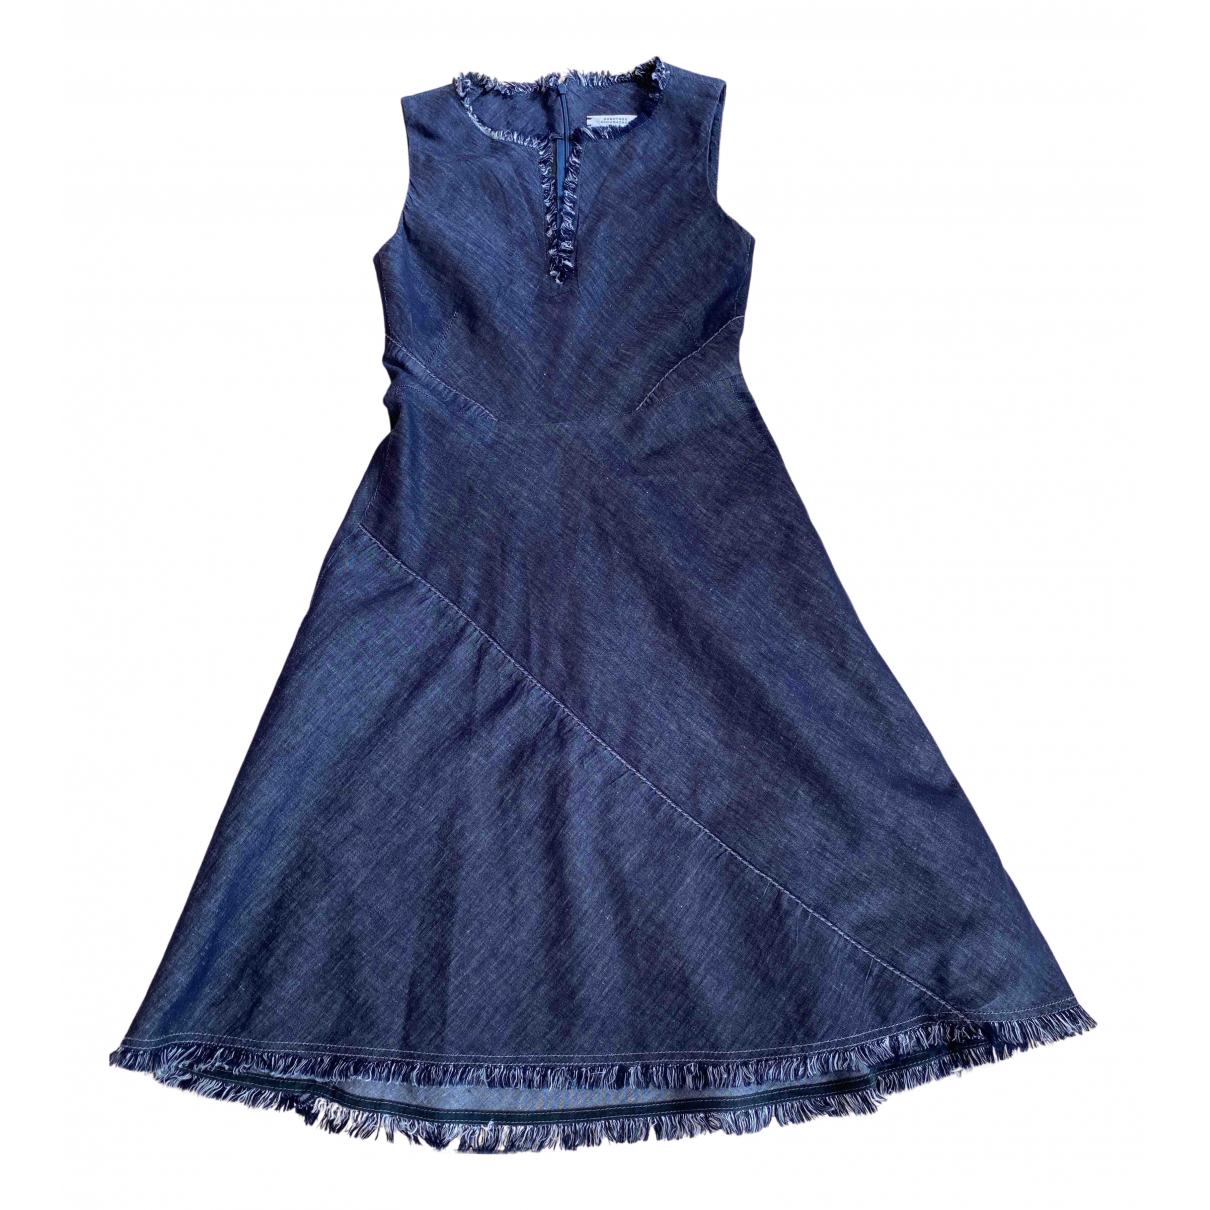 Dorothee Schumacher N Blue Denim - Jeans dress for Women 1 US